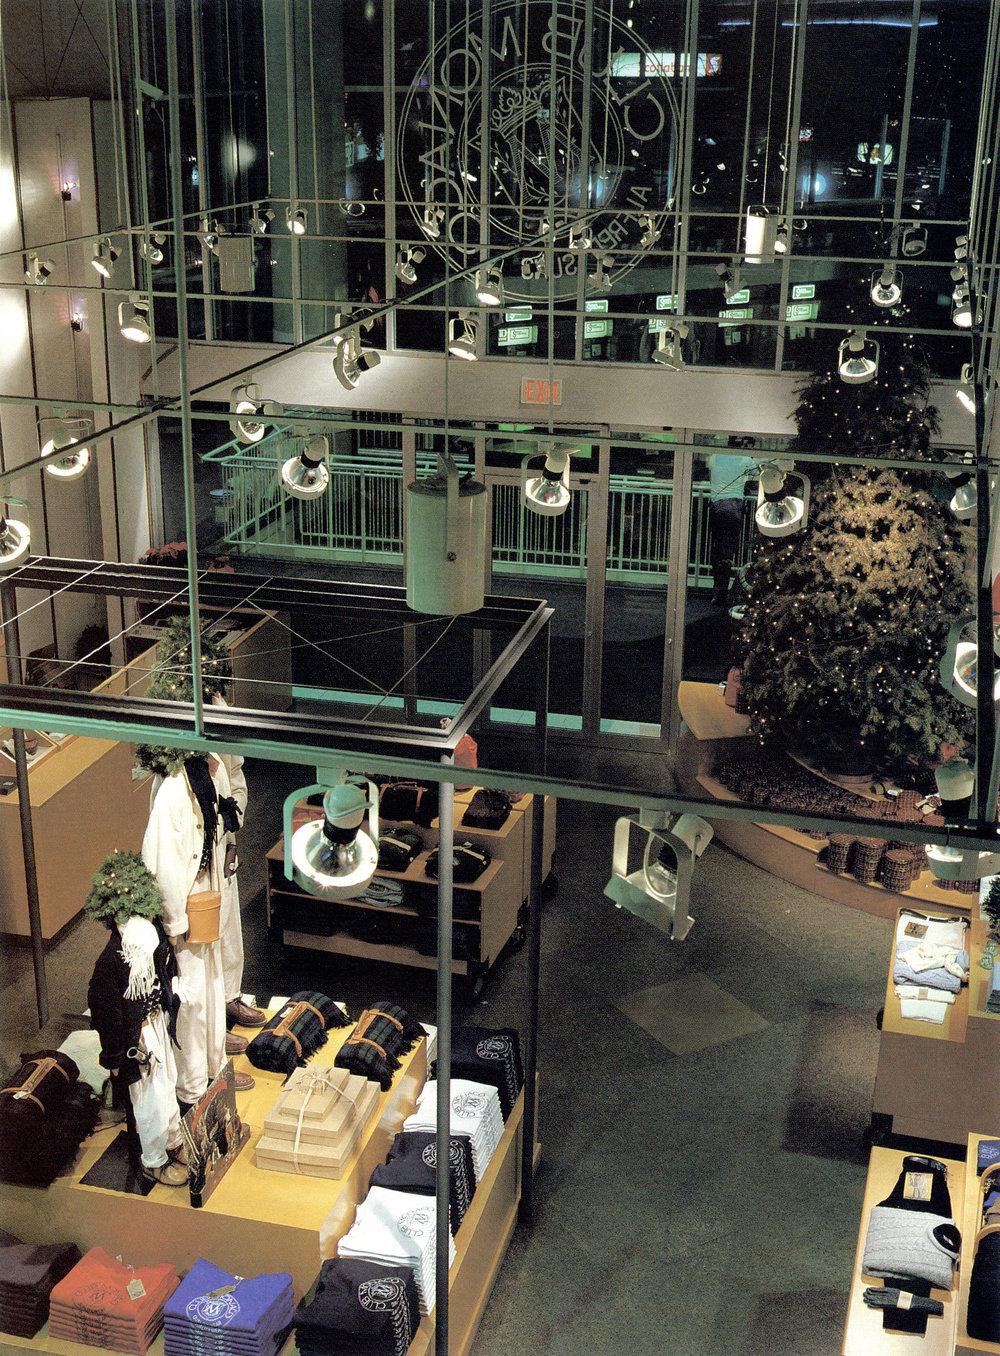 Holiday 1985 inside the Eaton Center Club Monaco store.